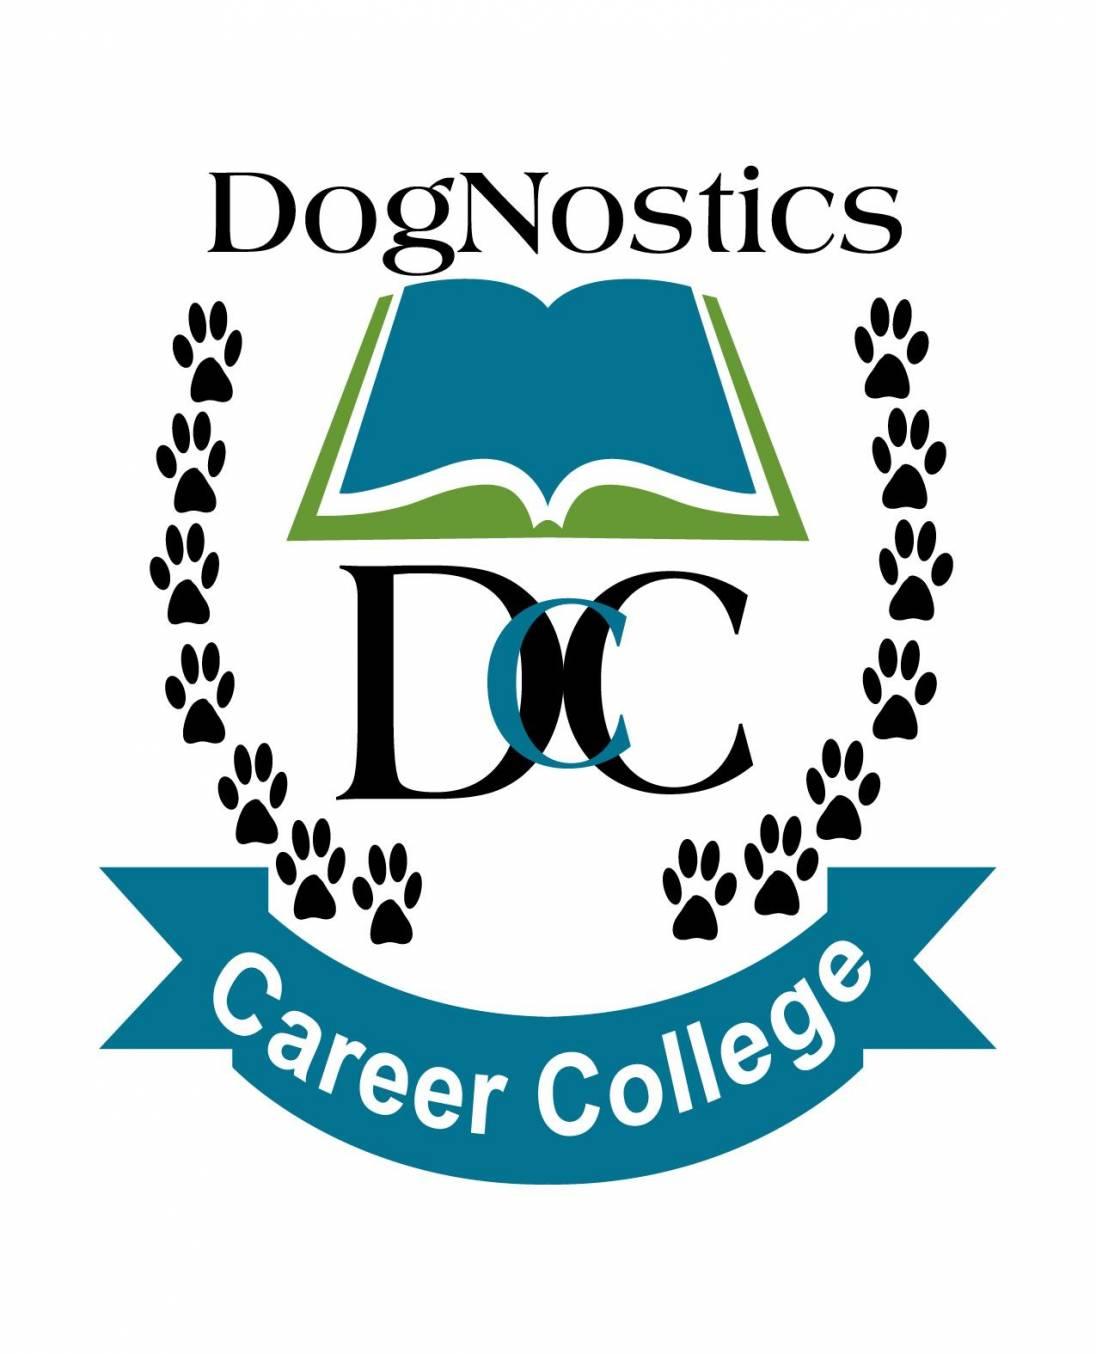 DogNostics Career College